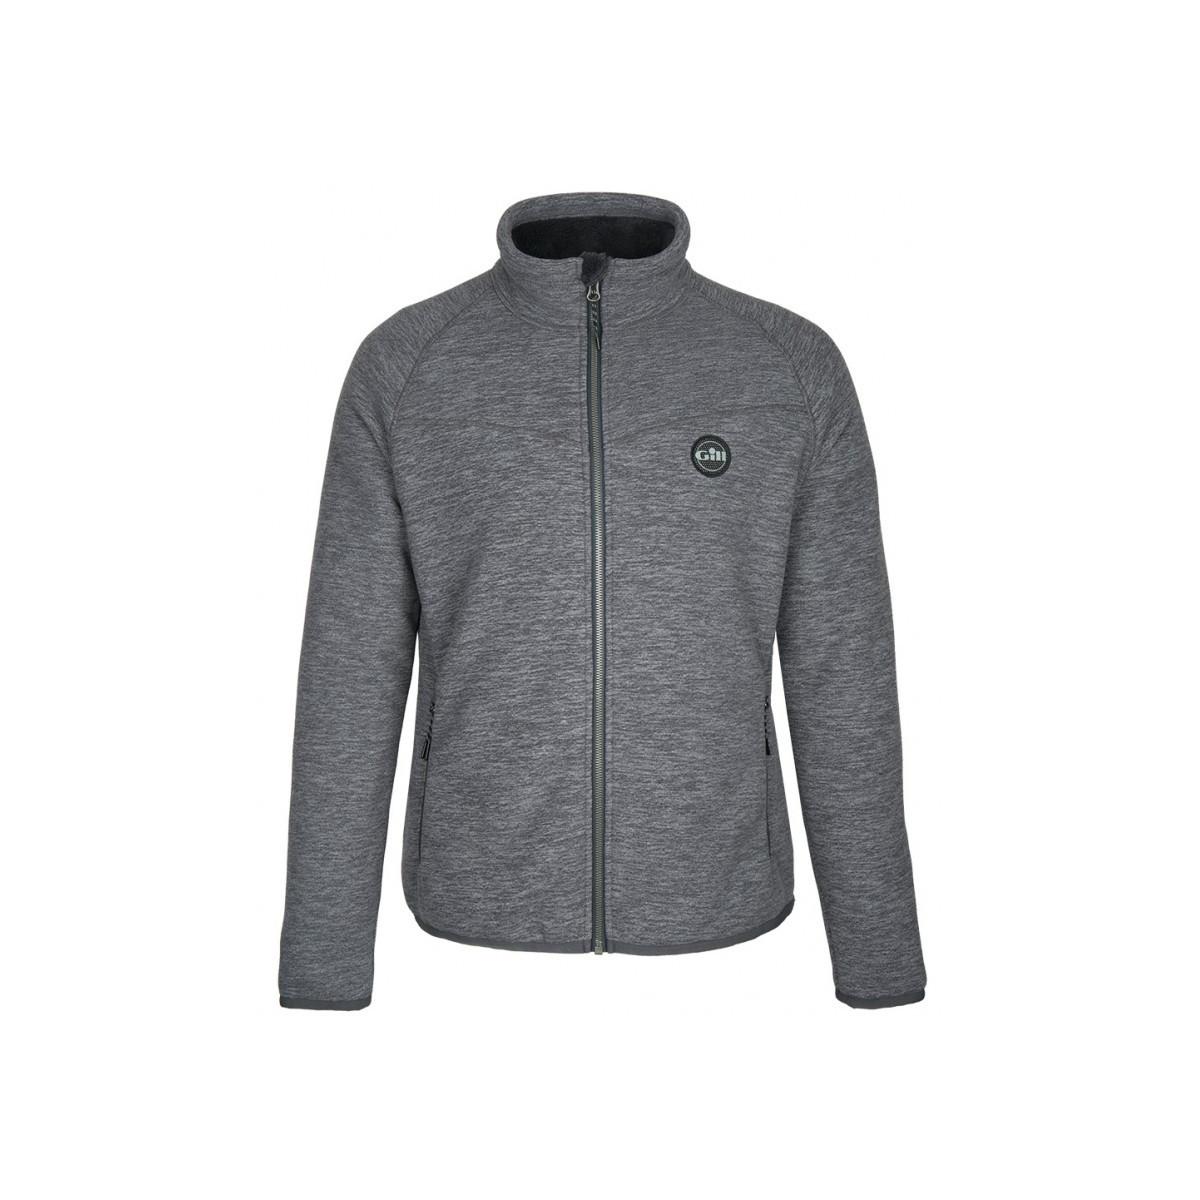 Jacket graphite Gill Polar Fleece Jacke Herren Yyf76bvg